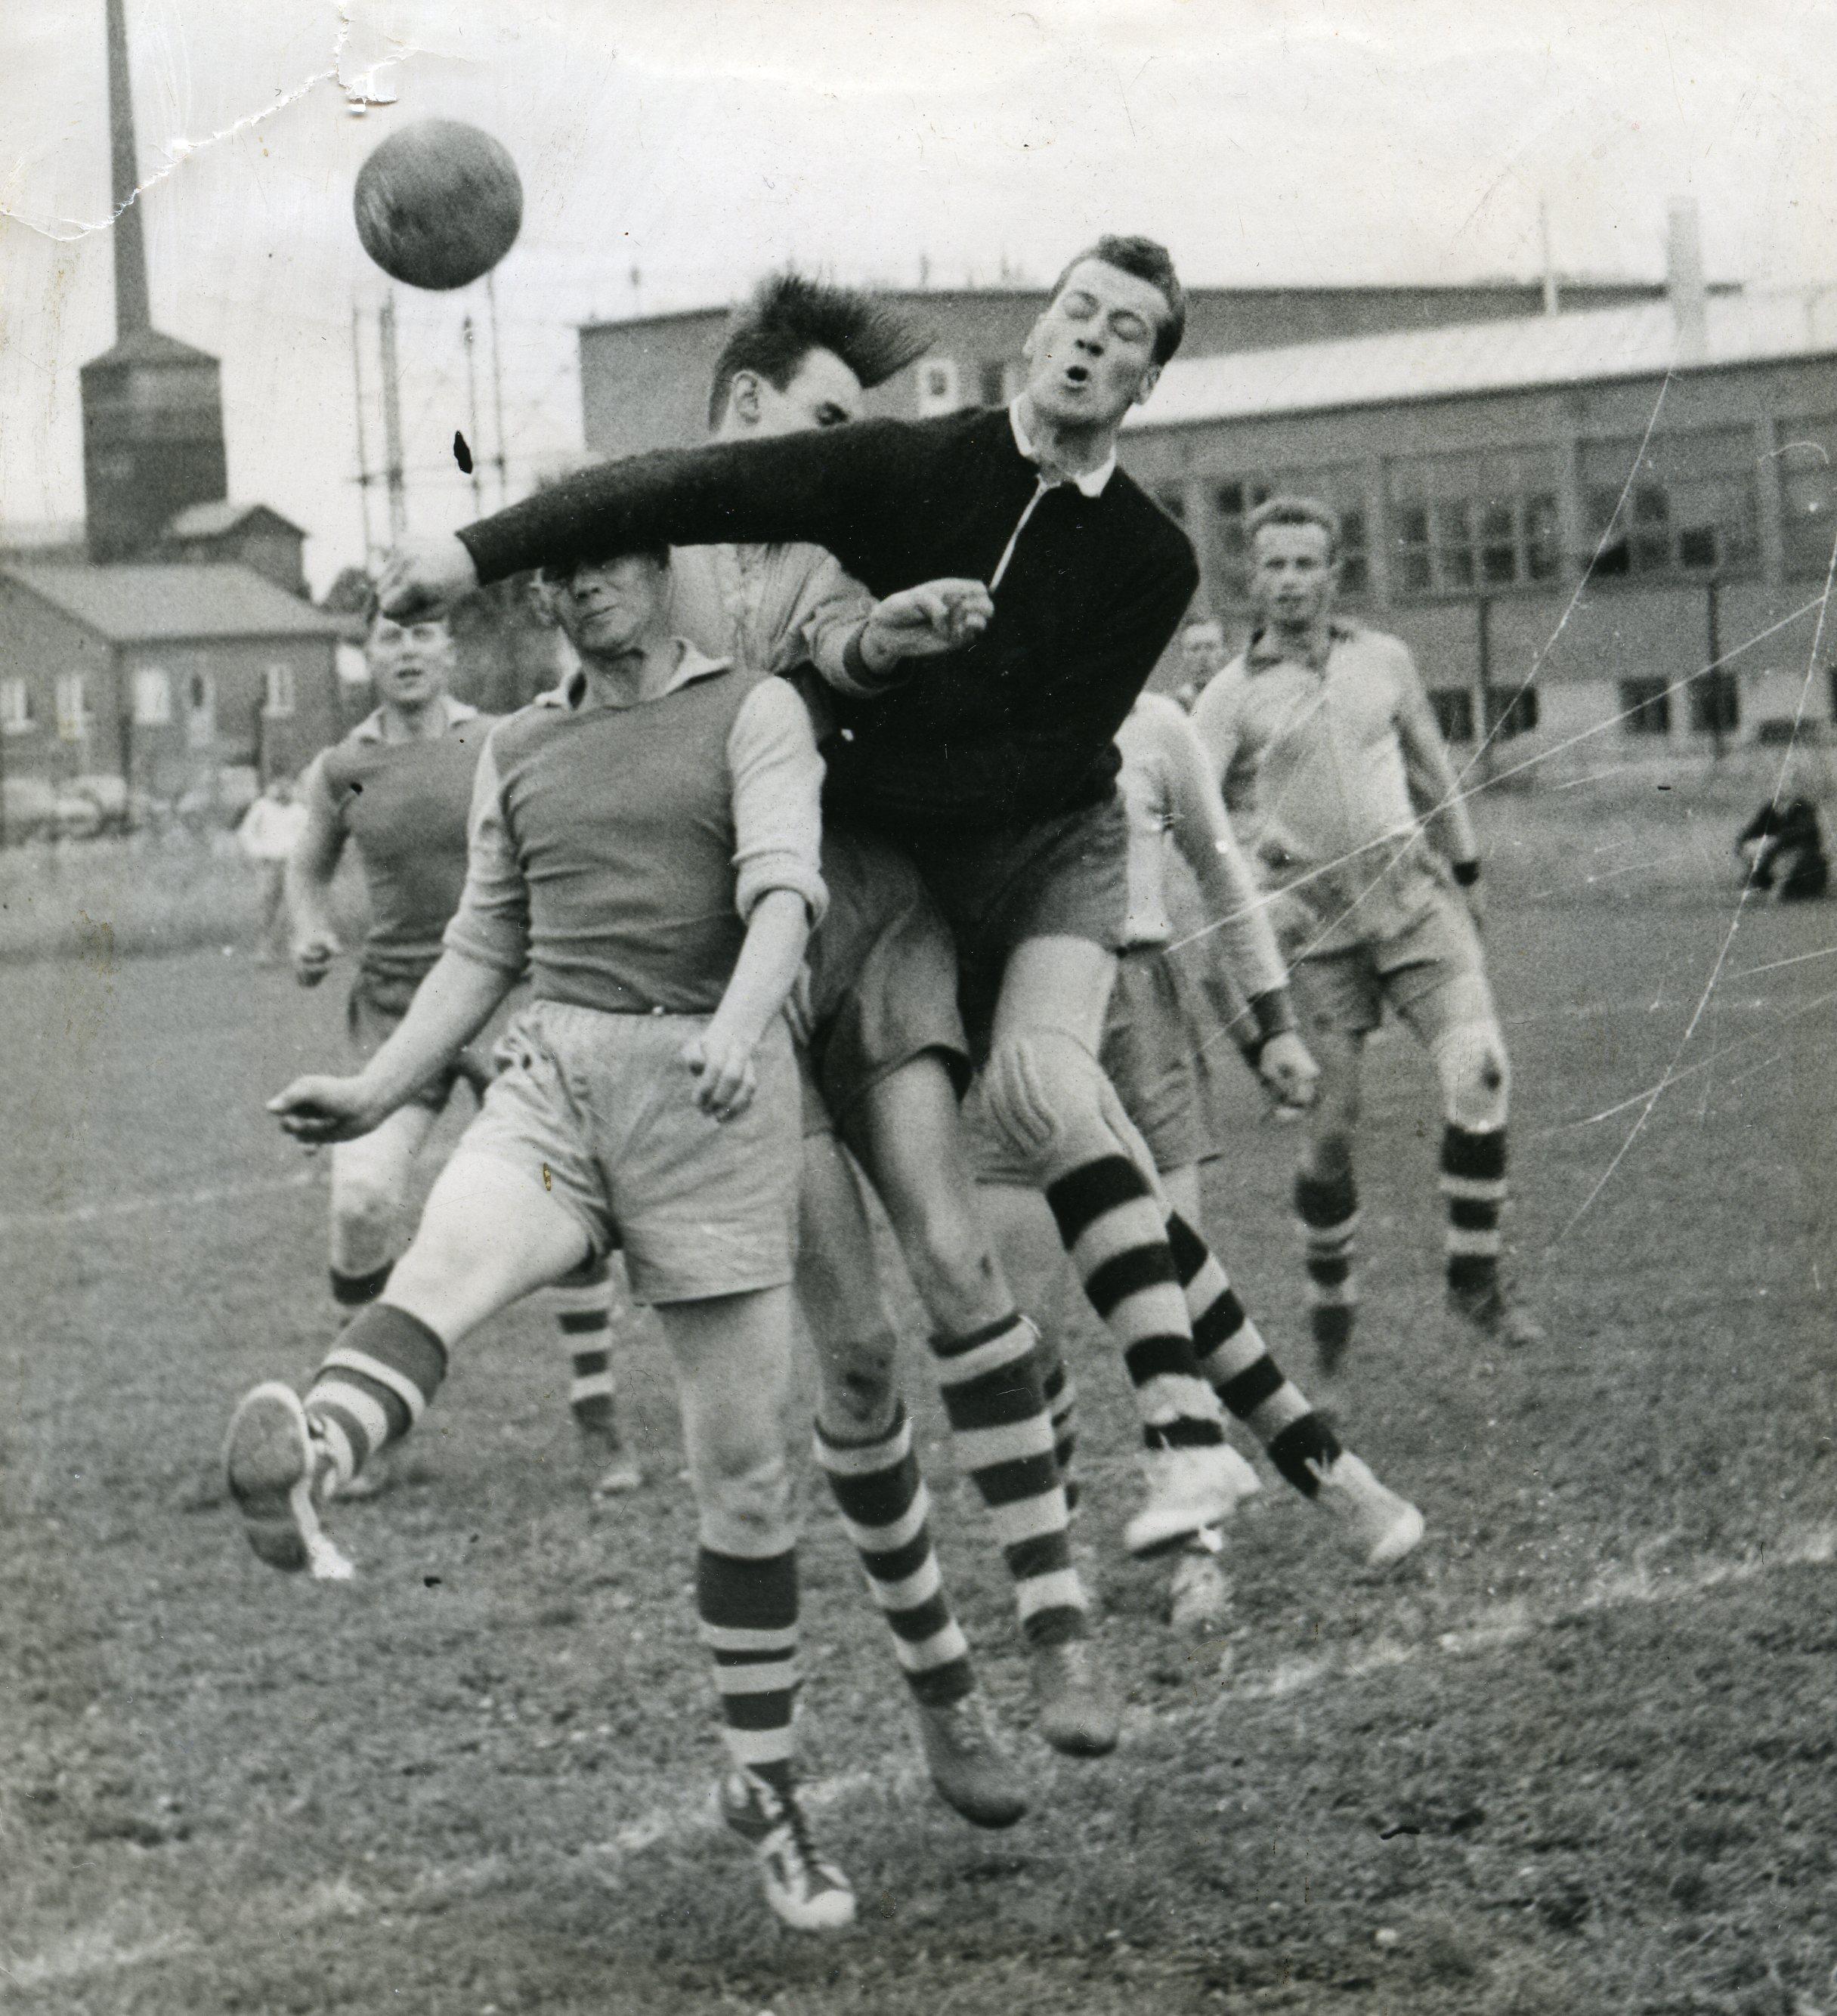 Kamp om fotbollen. Foto: okänd. IF Sveas arkiv.